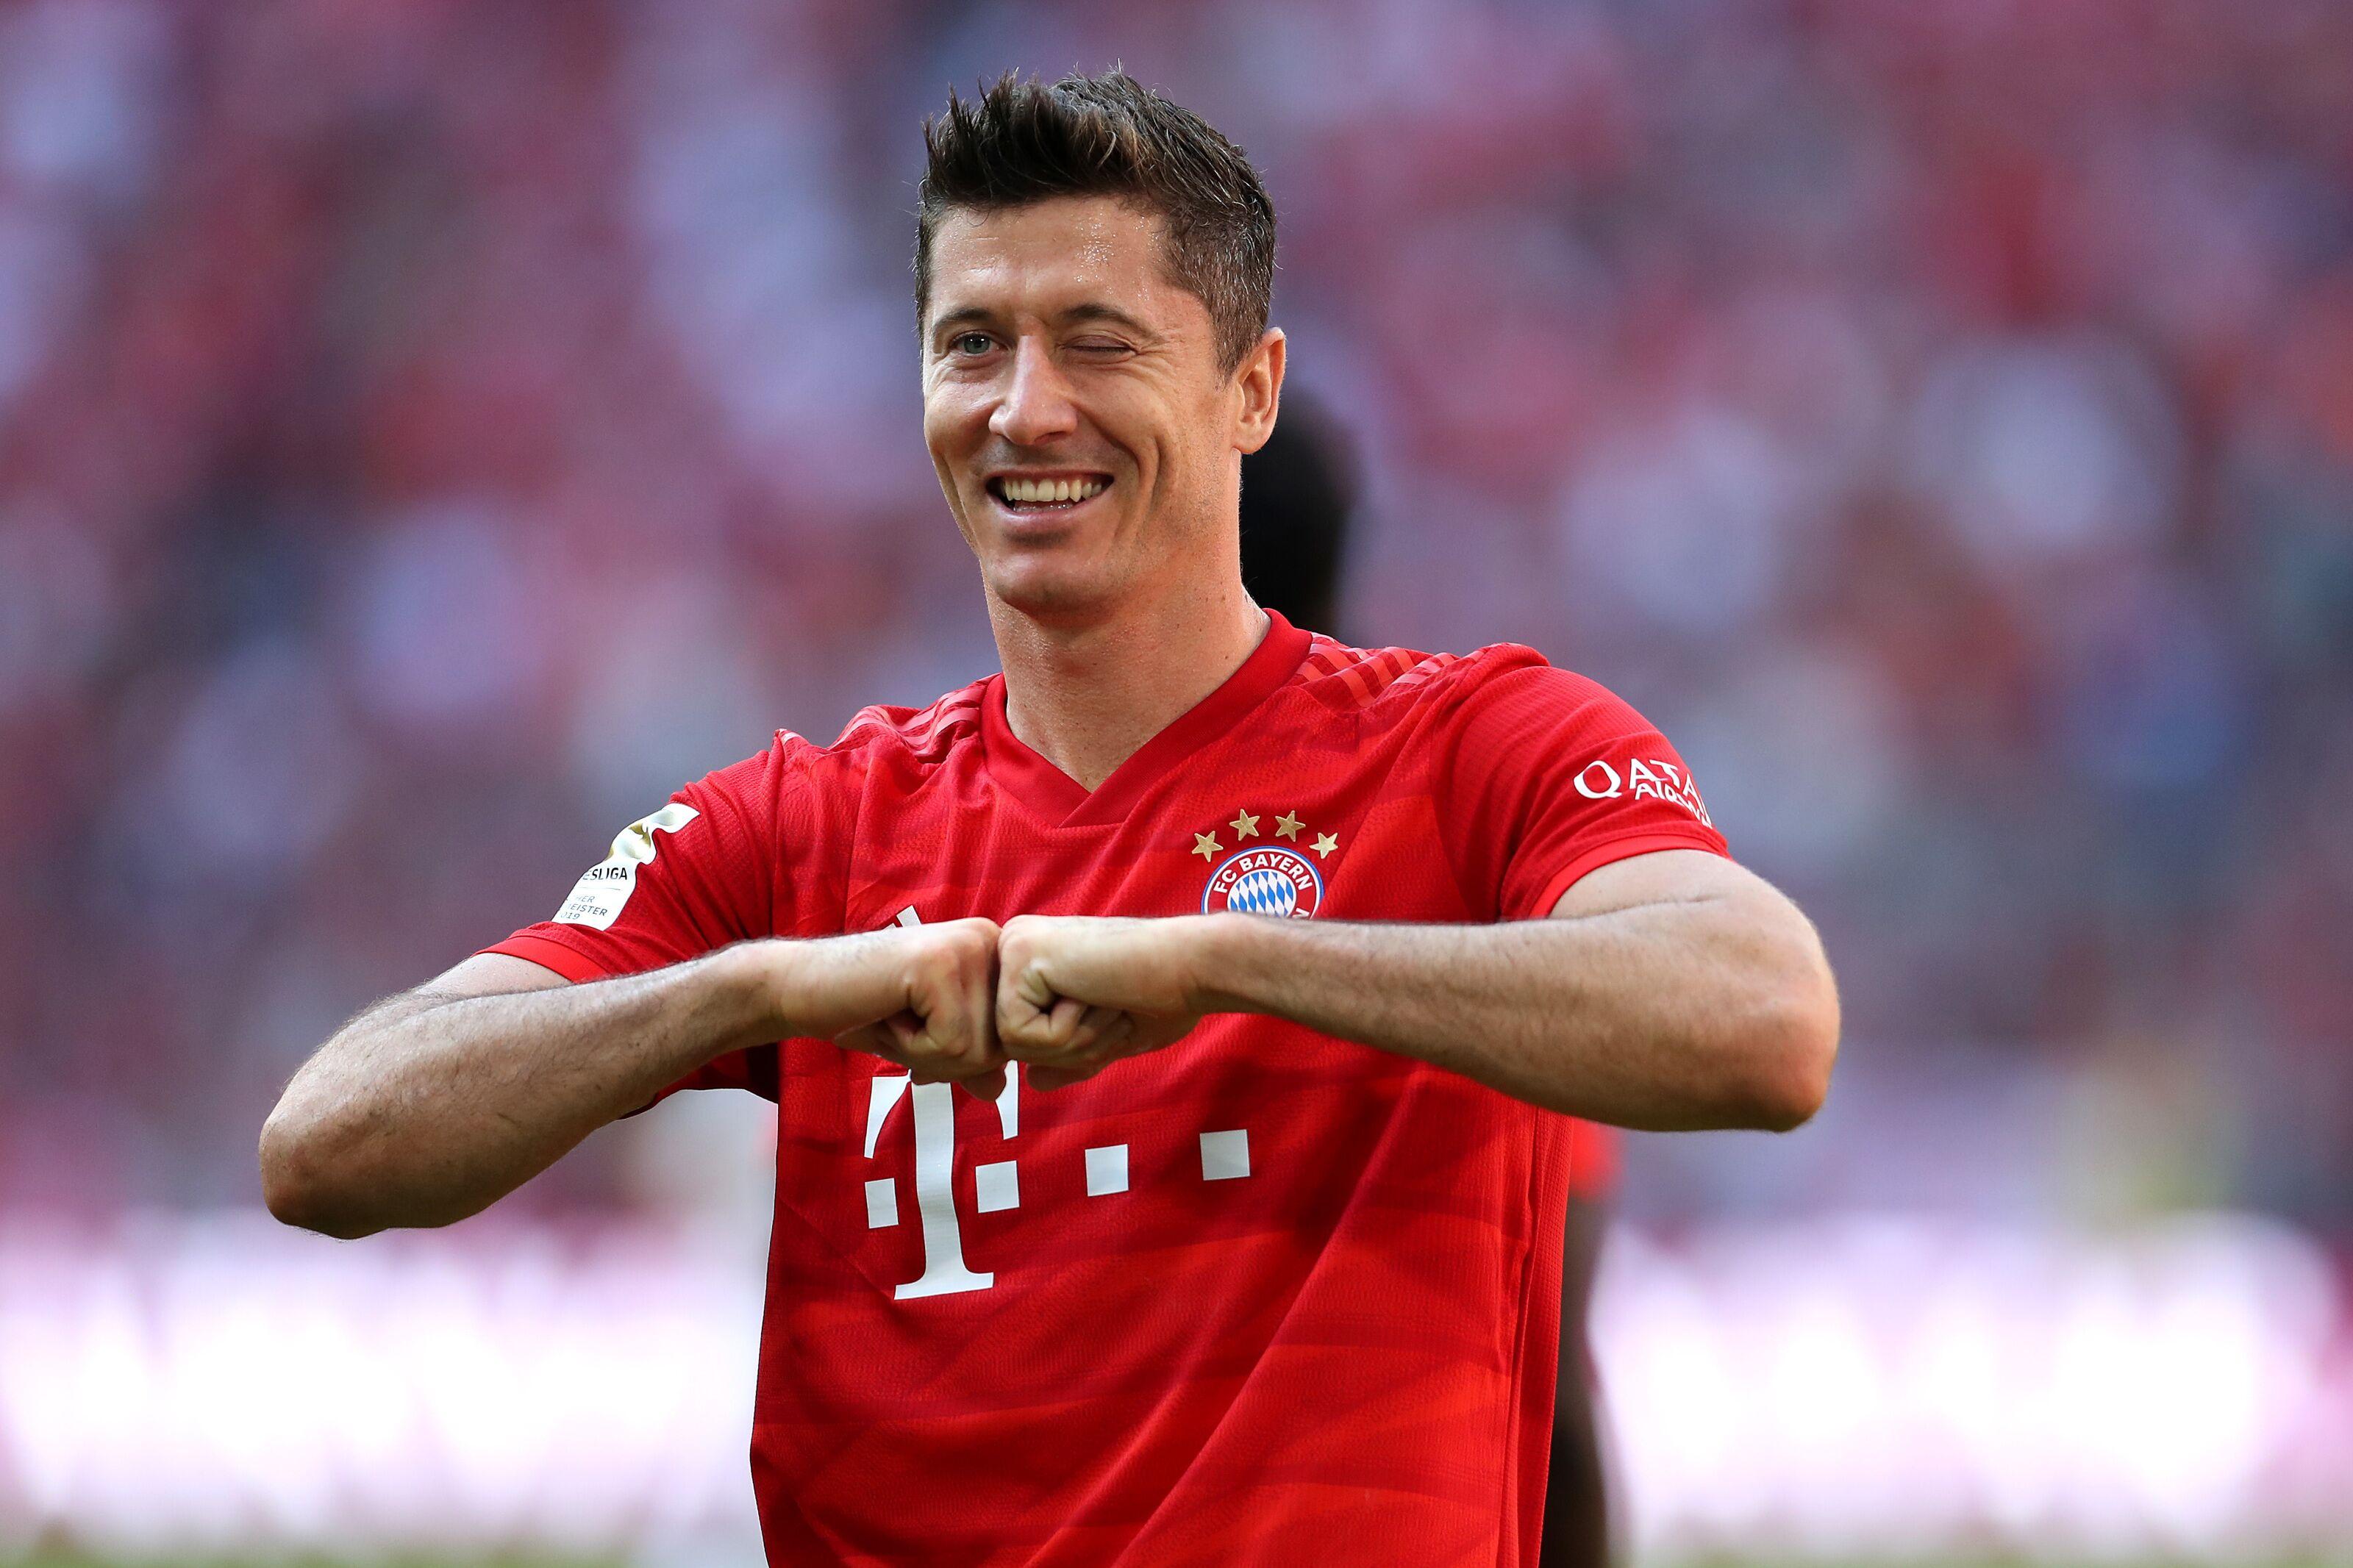 Real Madrid failed to sign Robert Lewandowski from Bayern Munich